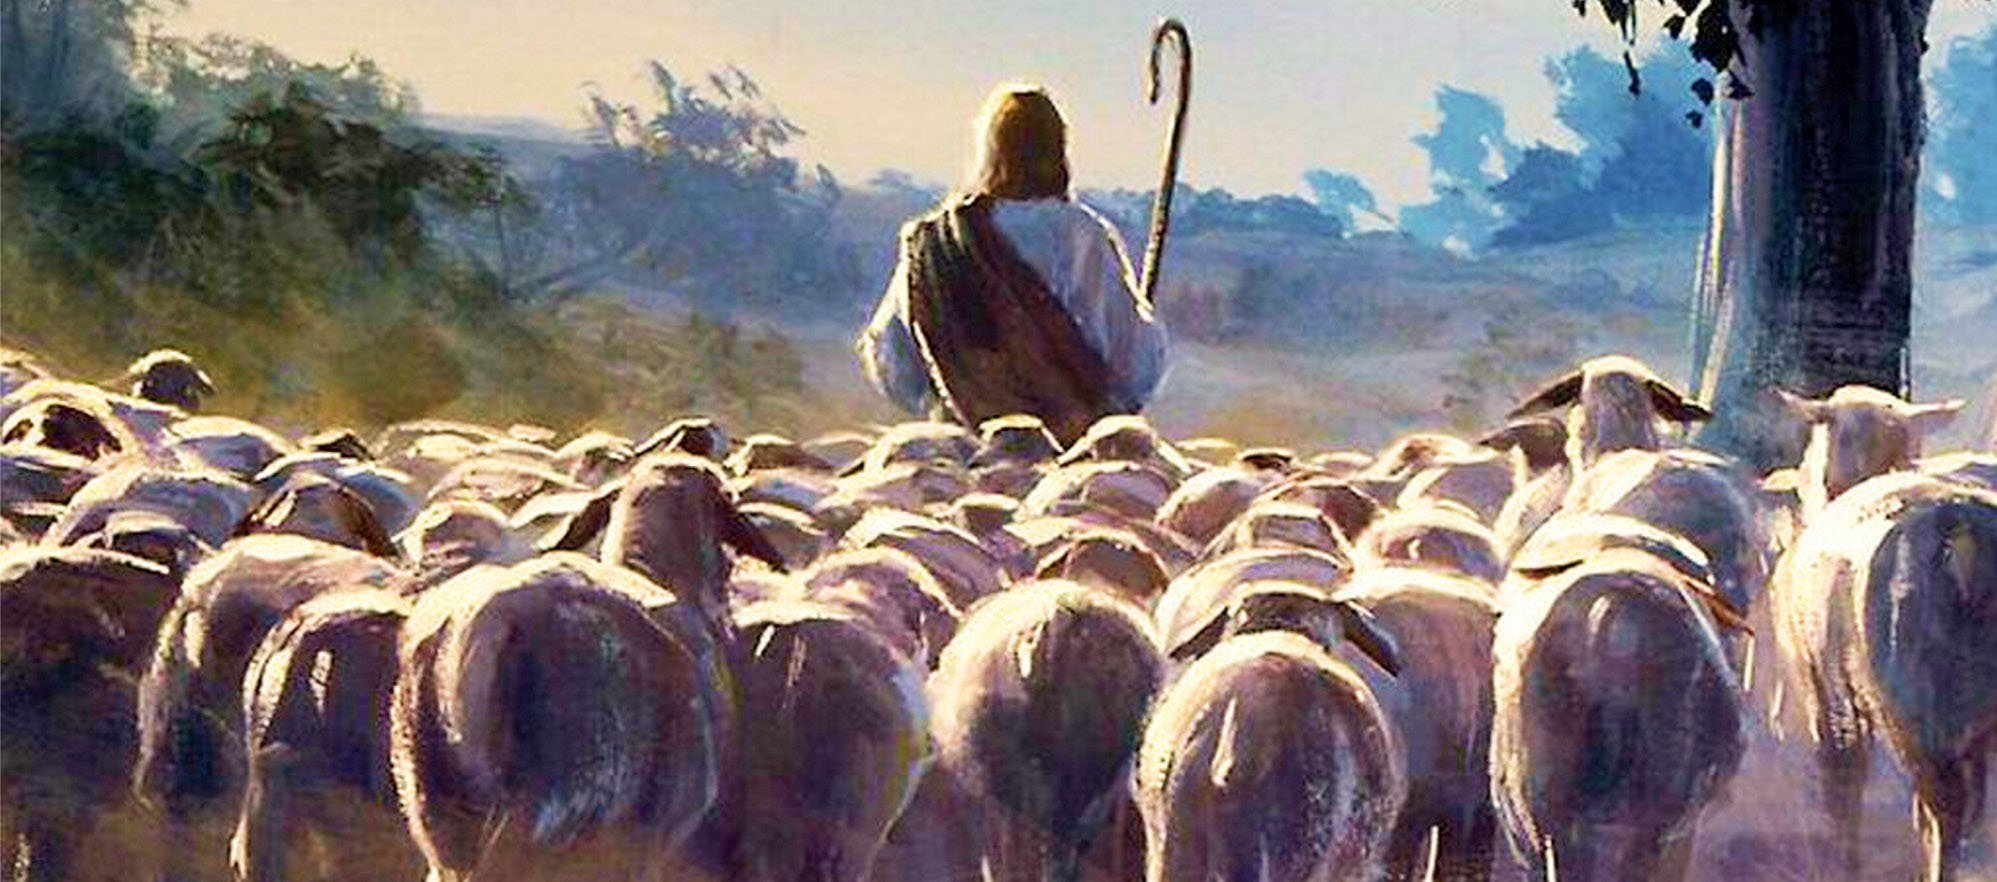 Invitation From Jesus Christ